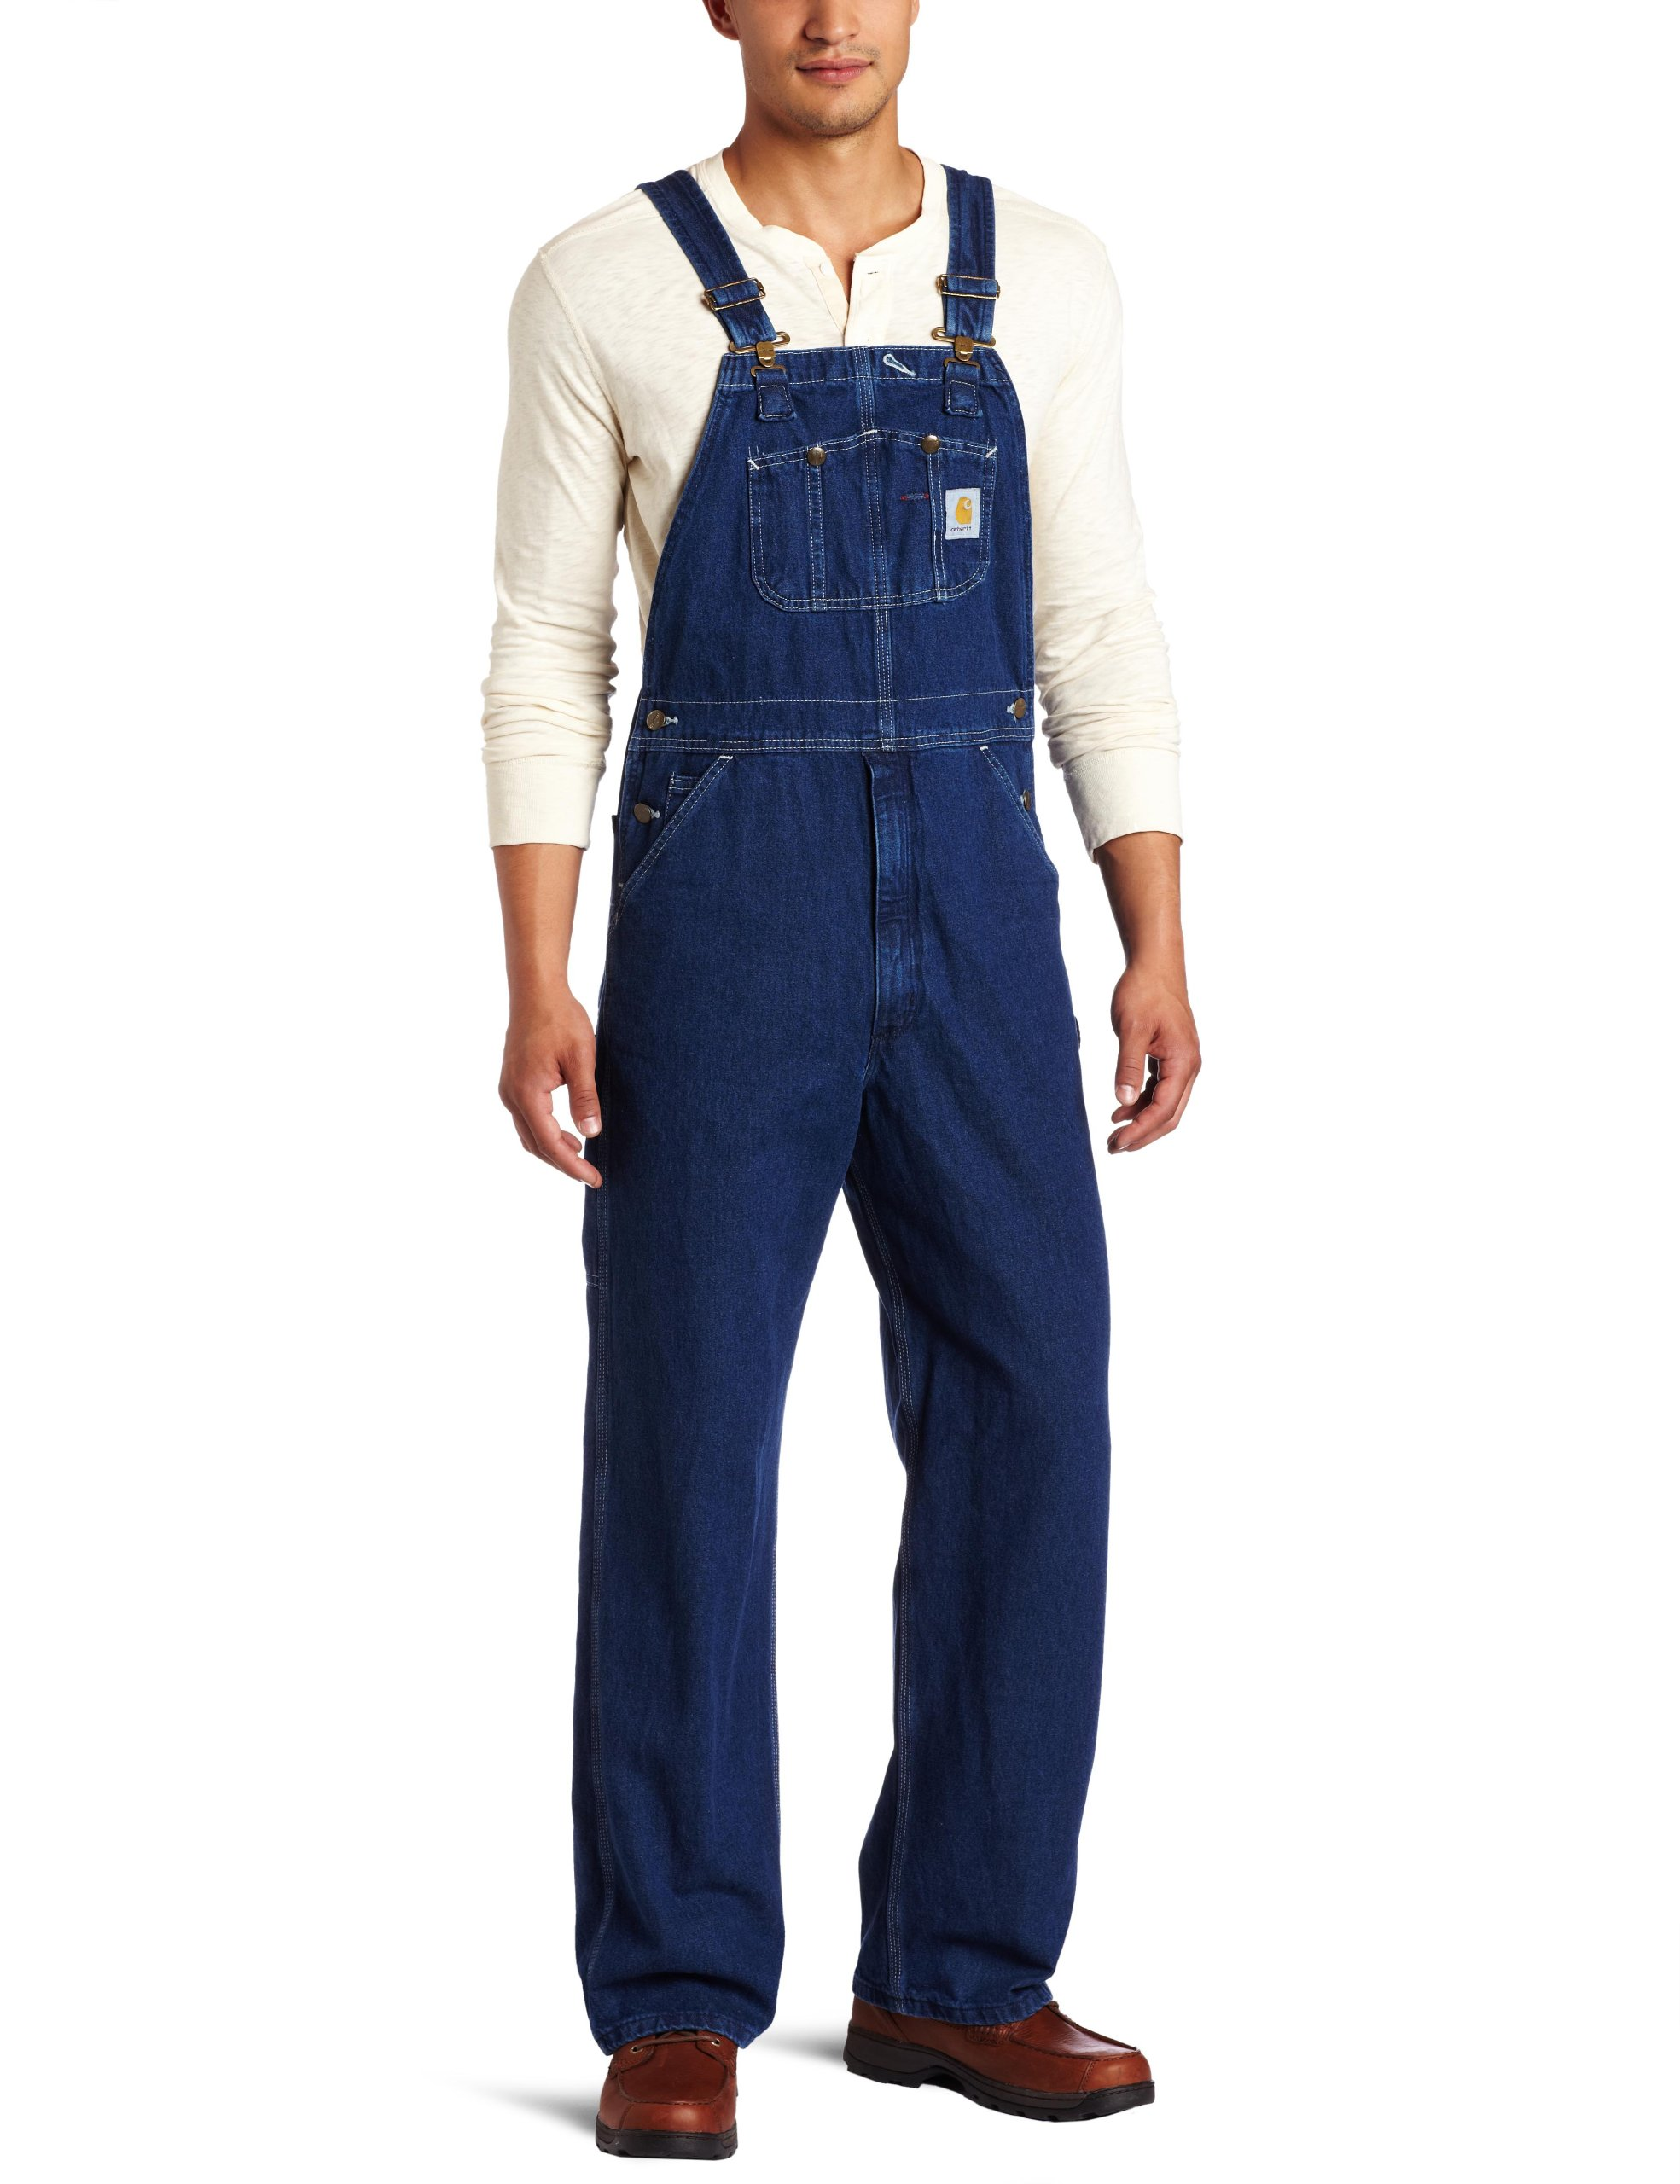 Carhartt Men's Washed-Denim Bib Overalls